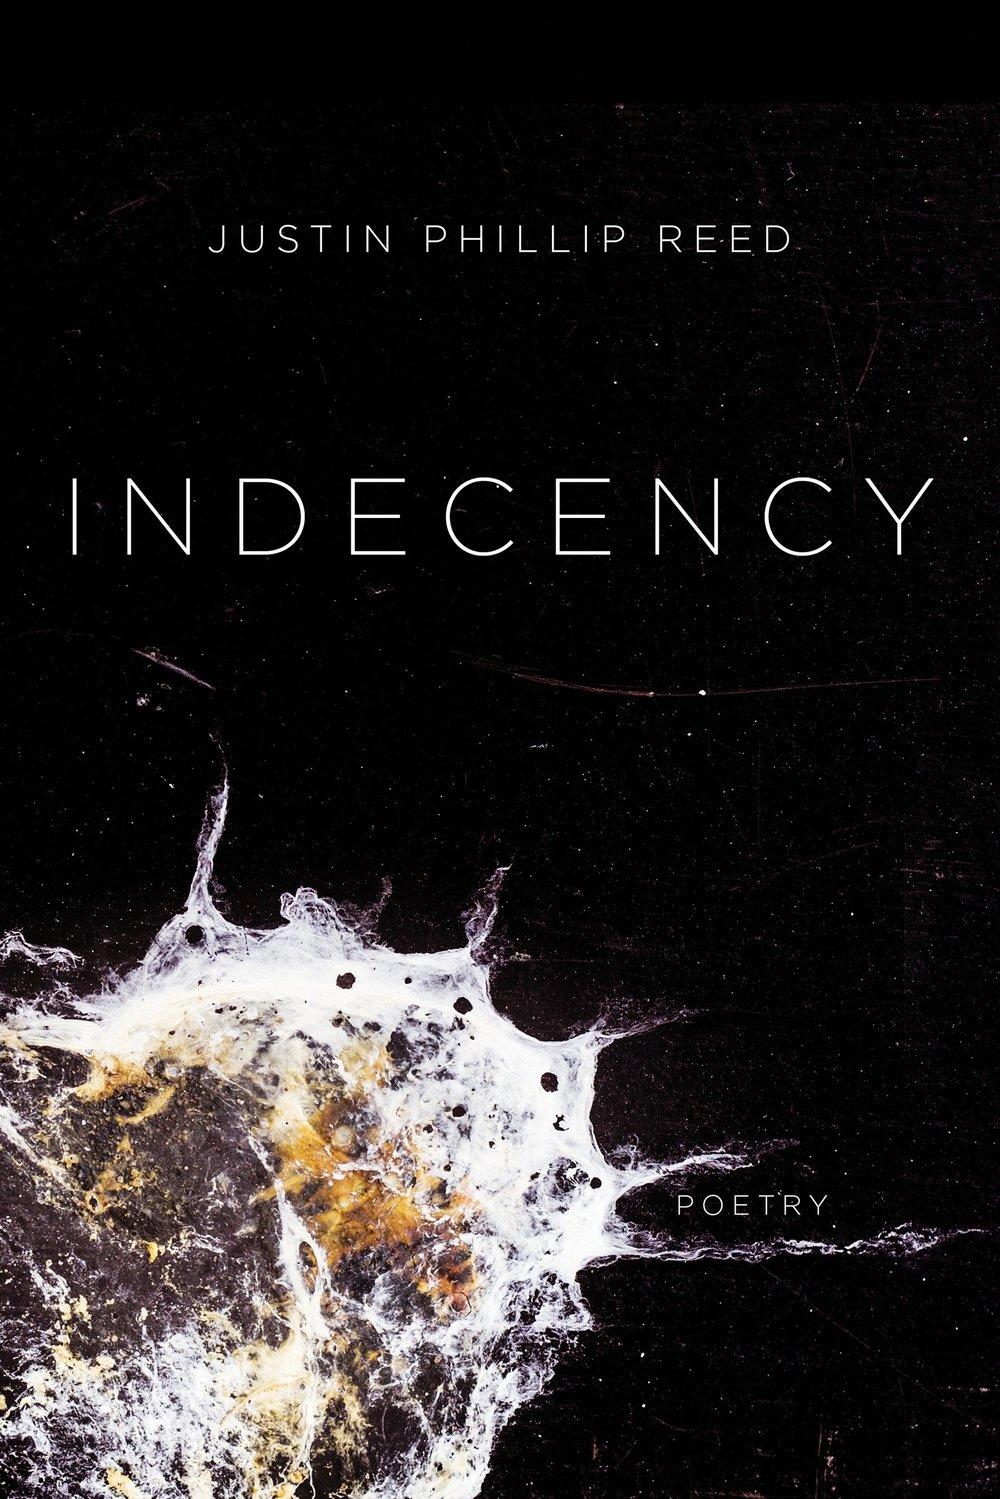 IndecencyCover.jpg